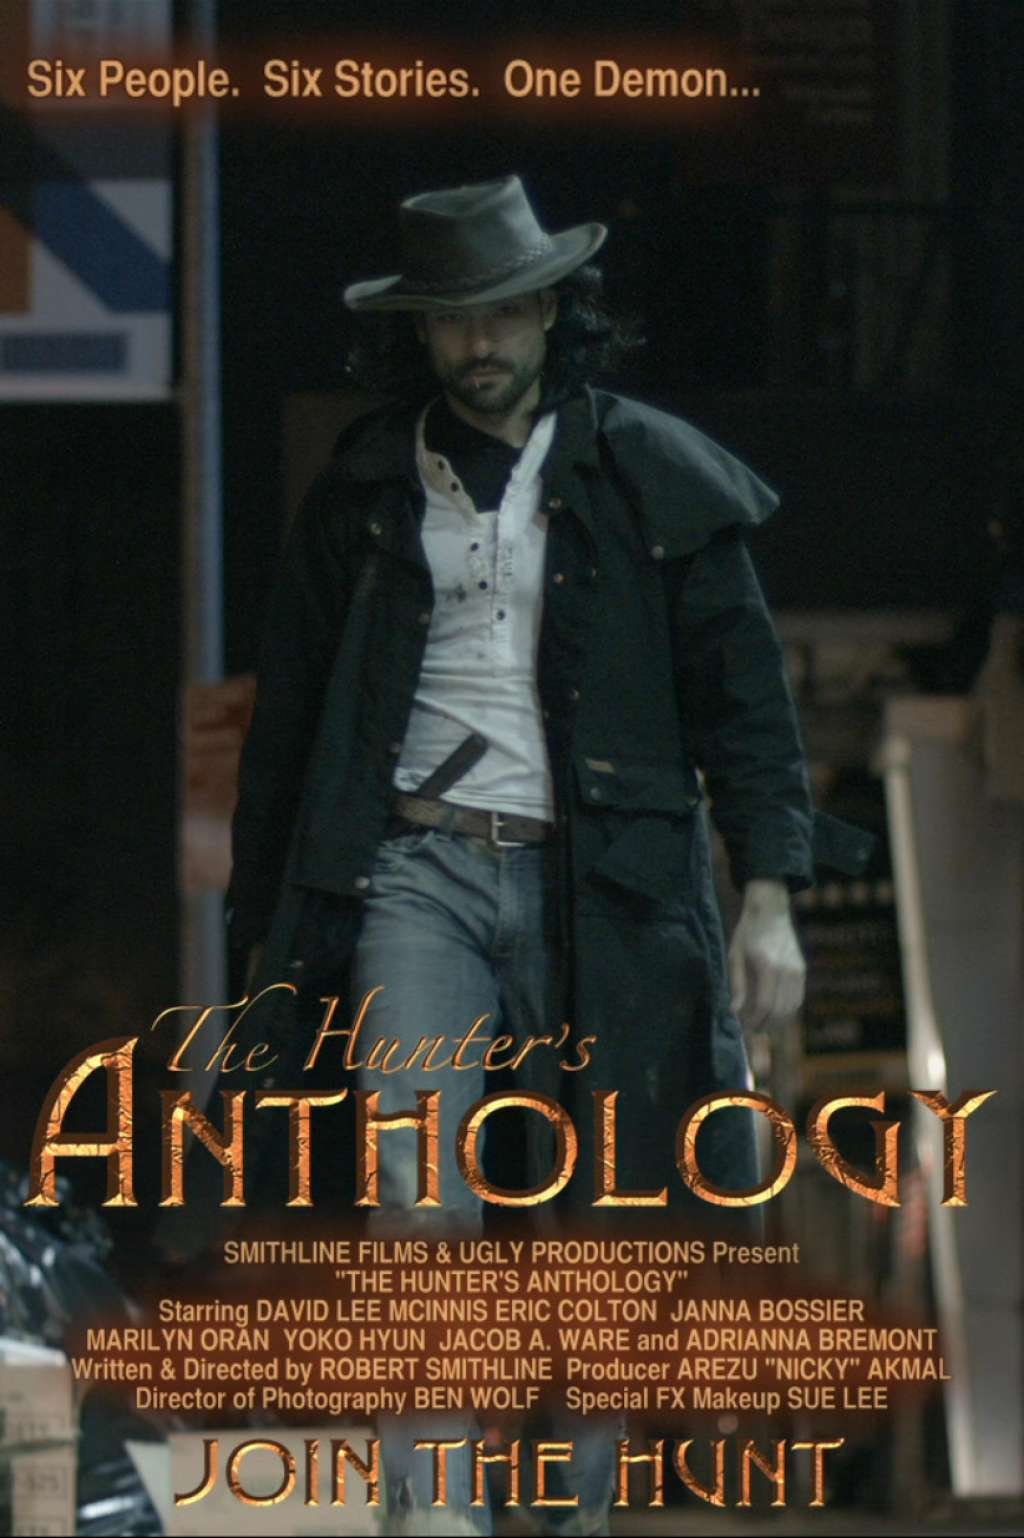 The Hunter's Anthology: Prologue kapak